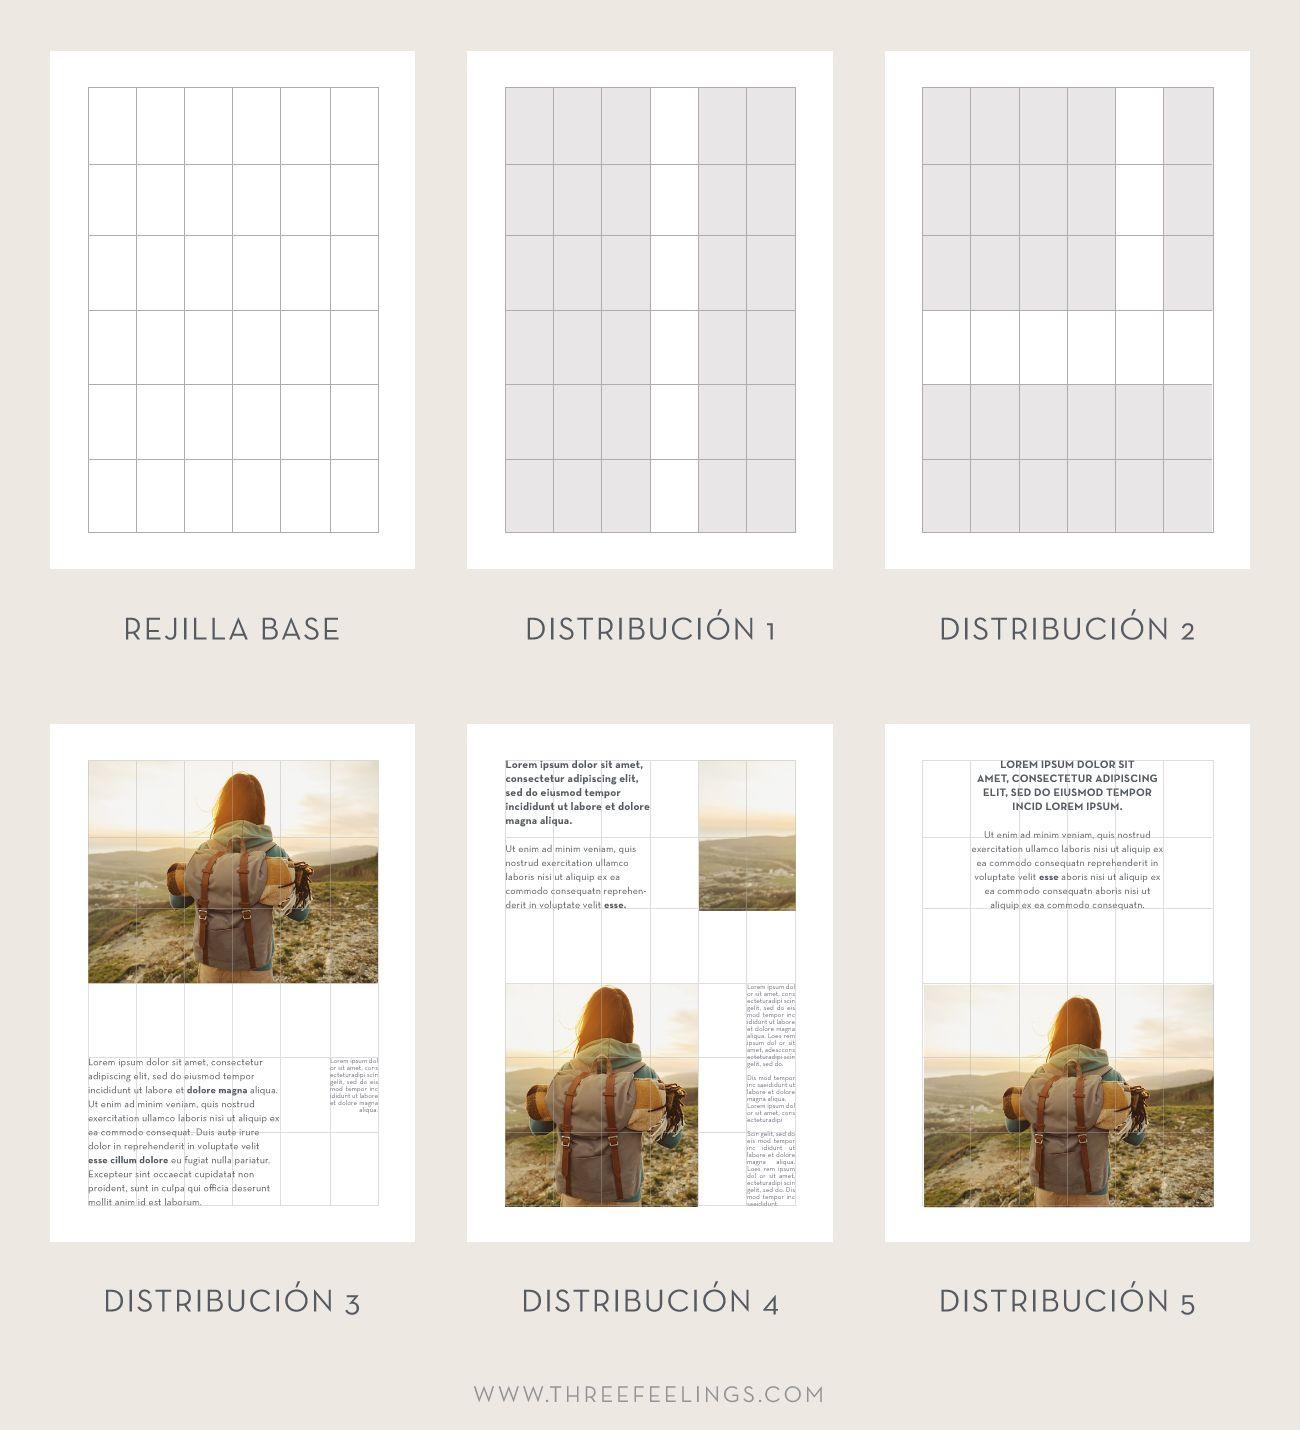 disenar-interior-infoproducto-composicion-profesional-threefeelings-01